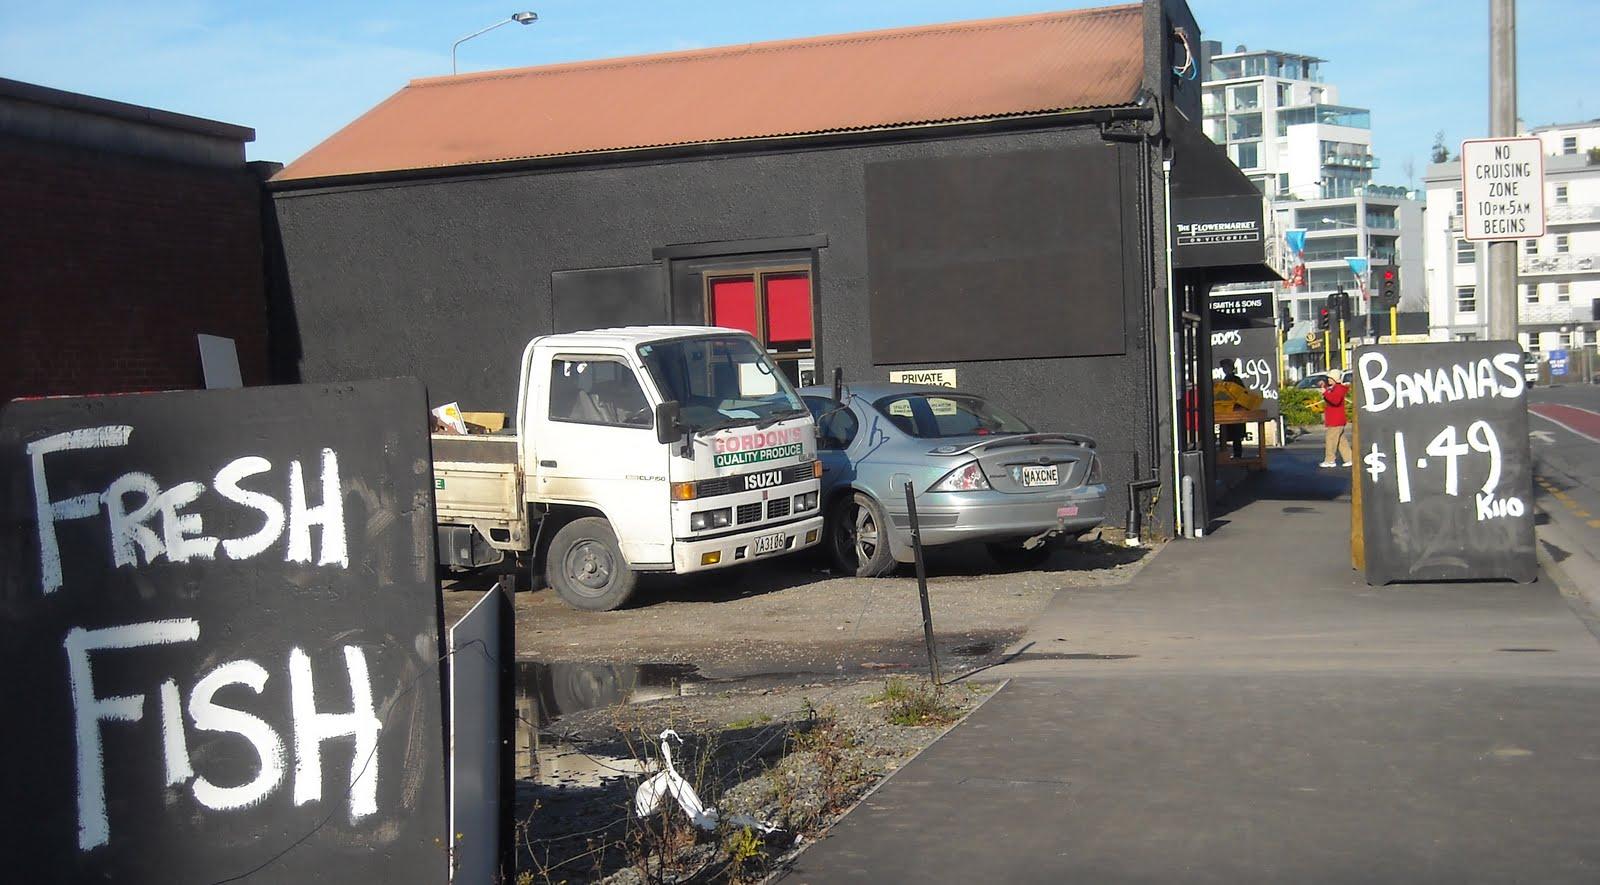 Woza Wanderer Cbd Red Zone Demolition Zone